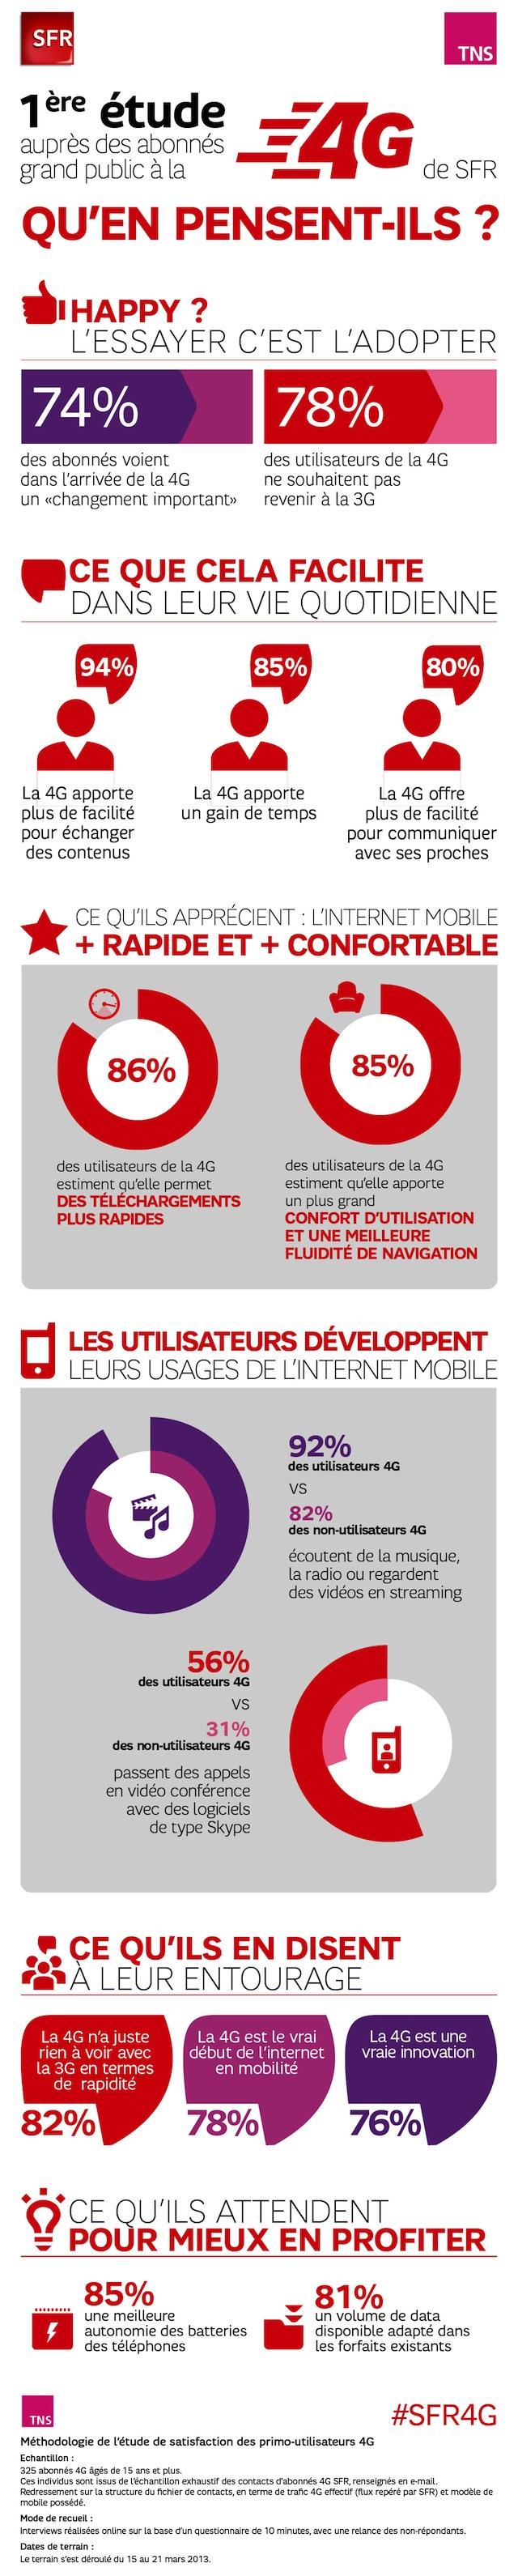 Infographie_SFR_4G_FrenchWeb